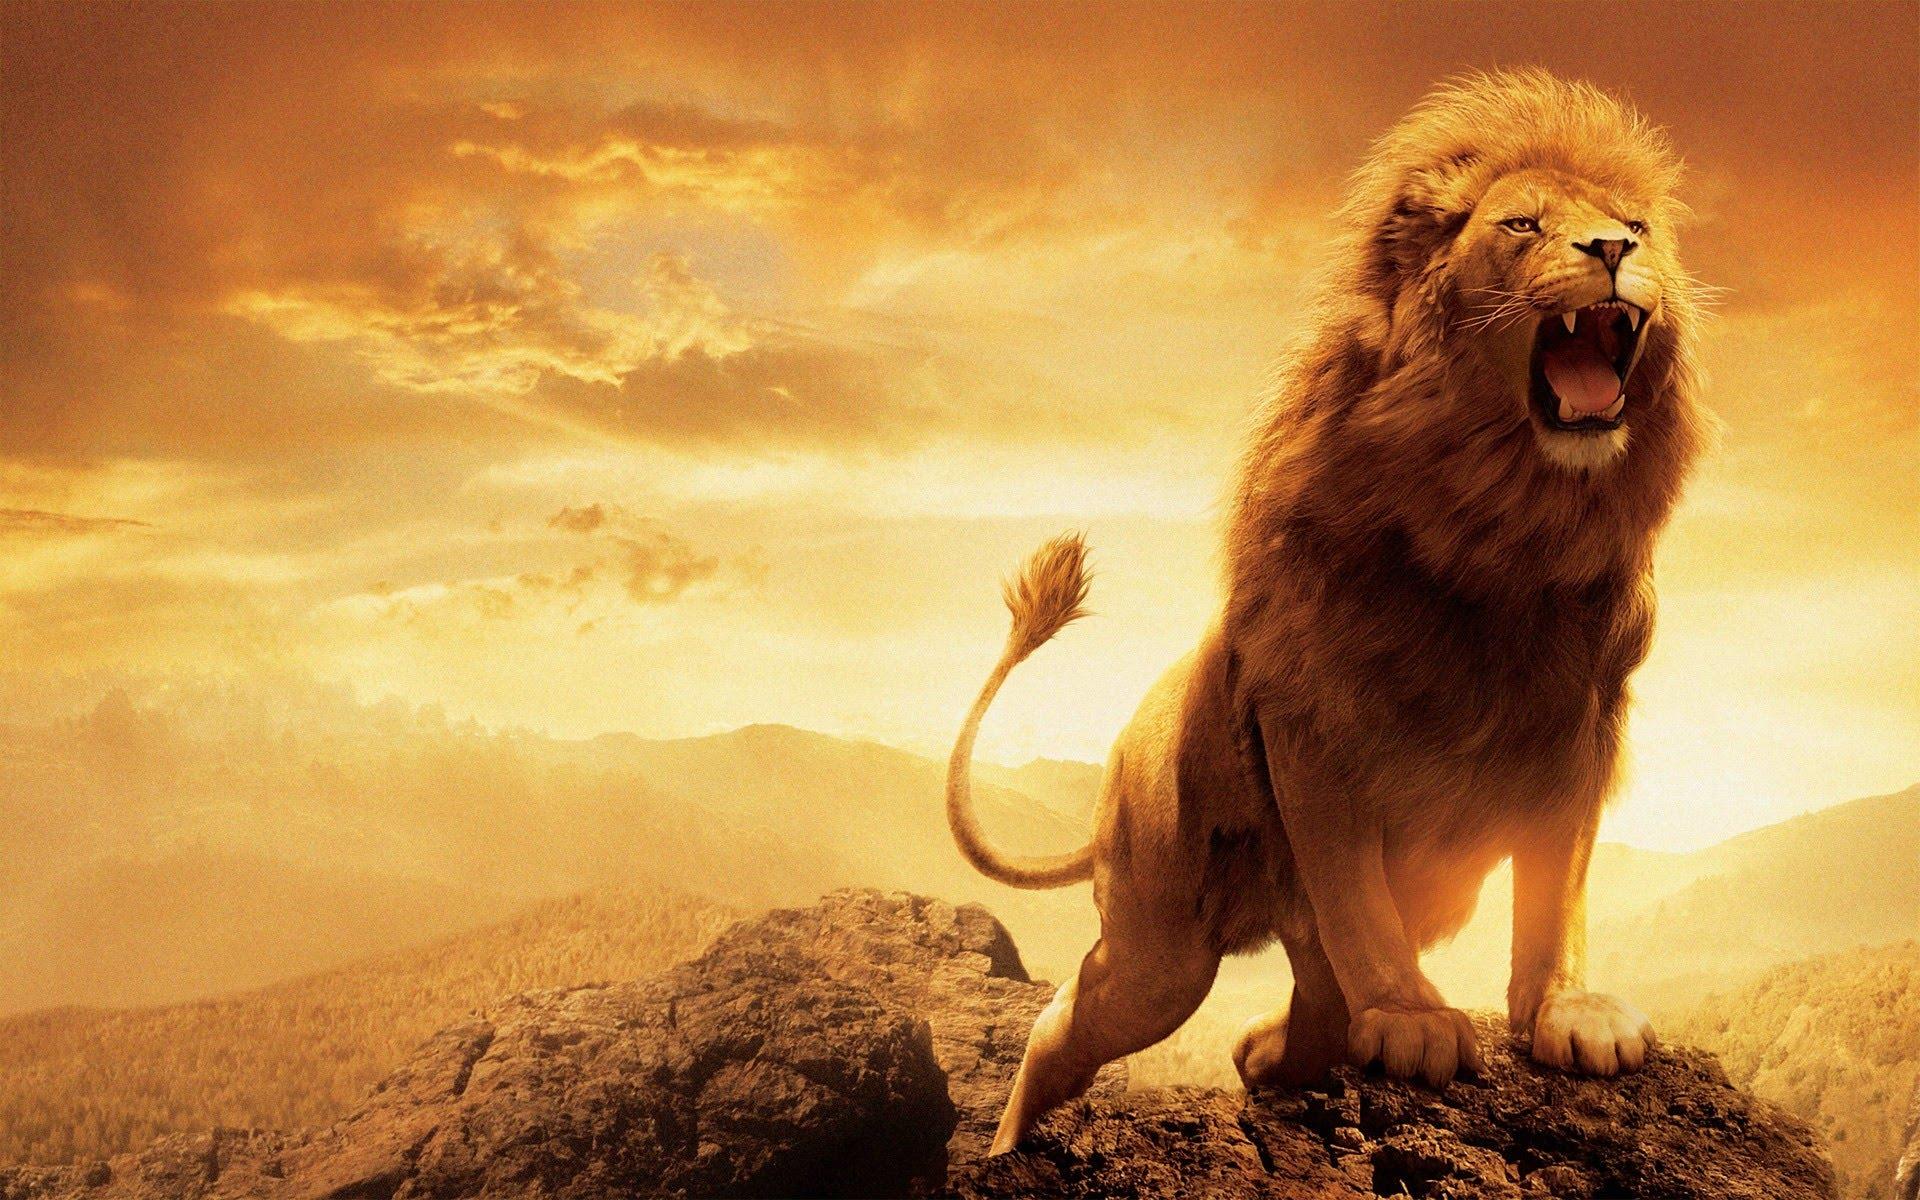 King of jungle photo